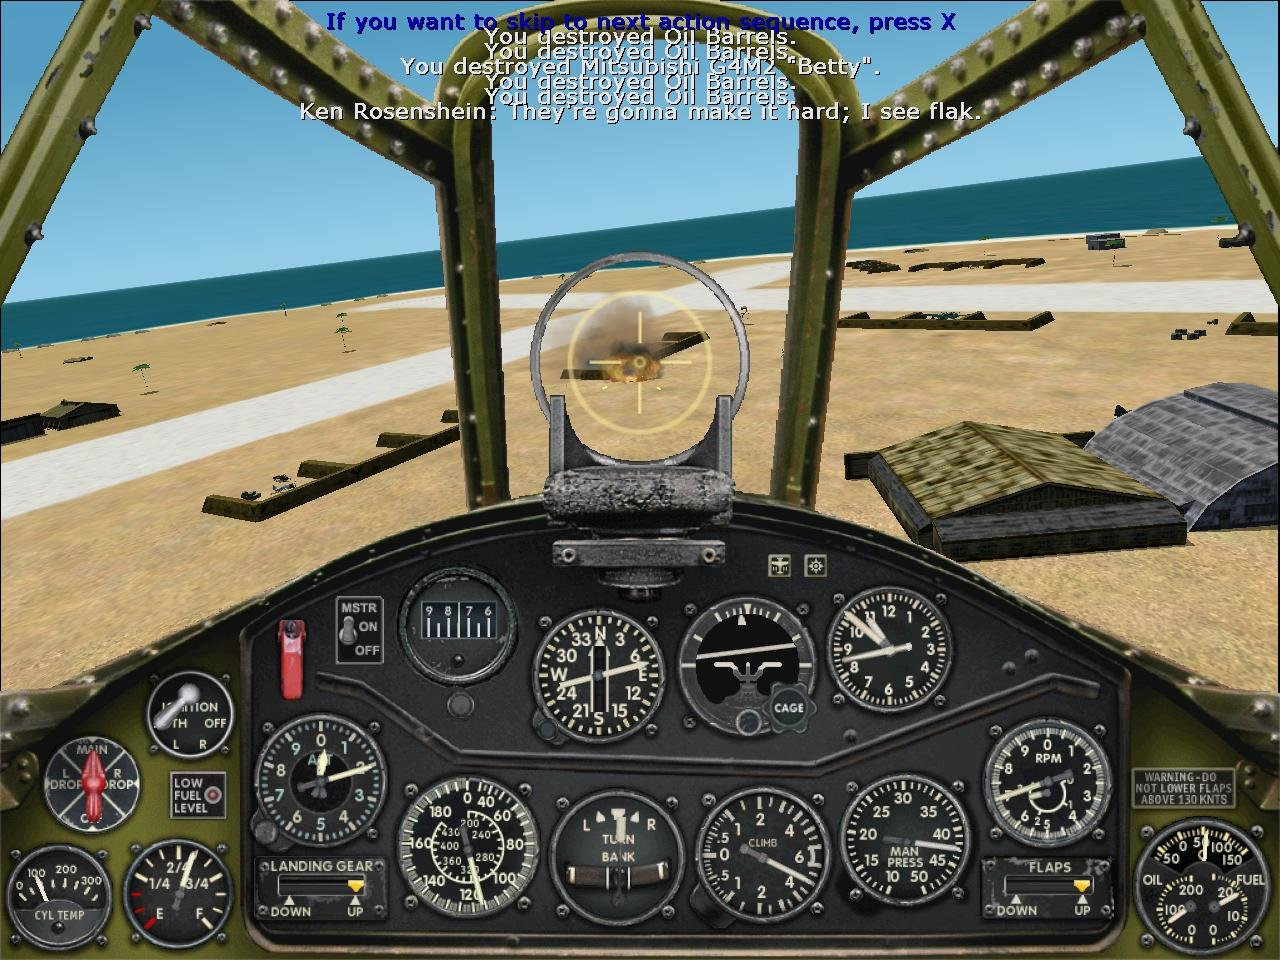 Microsoft combat flight simulator 2015 crashes